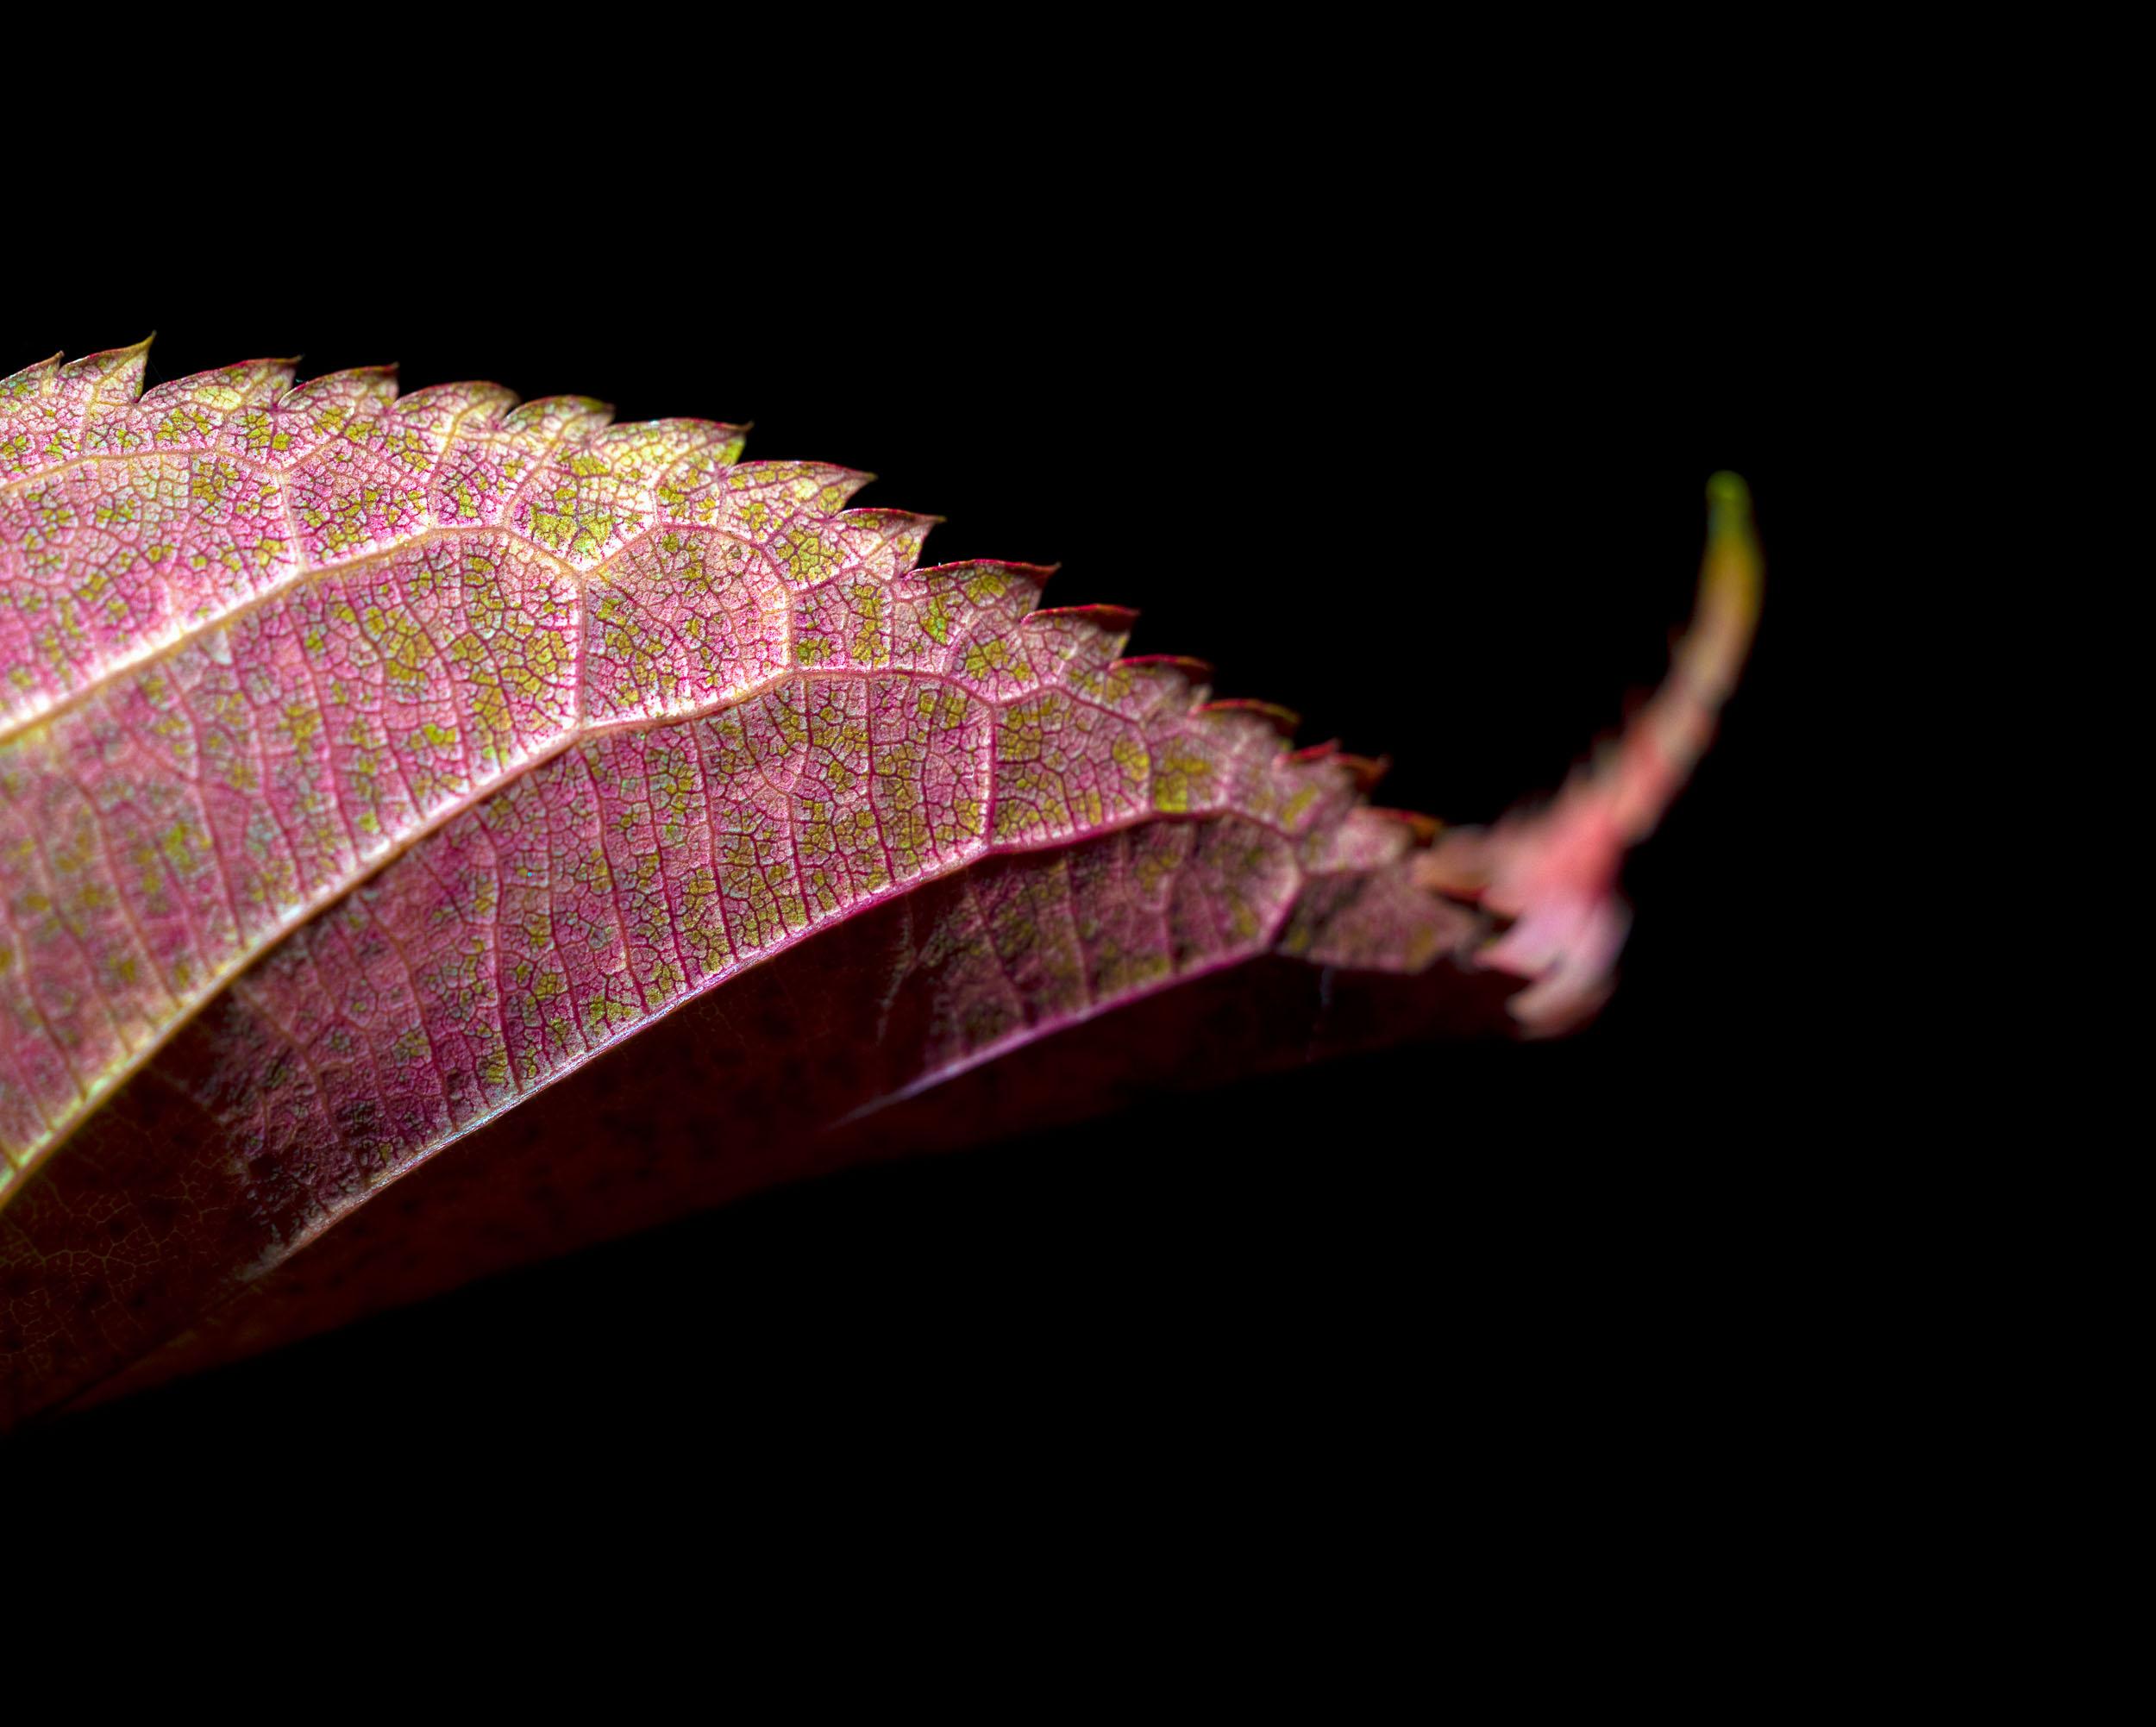 www.iaincrockart.com_flora-CF001768-2.jpg